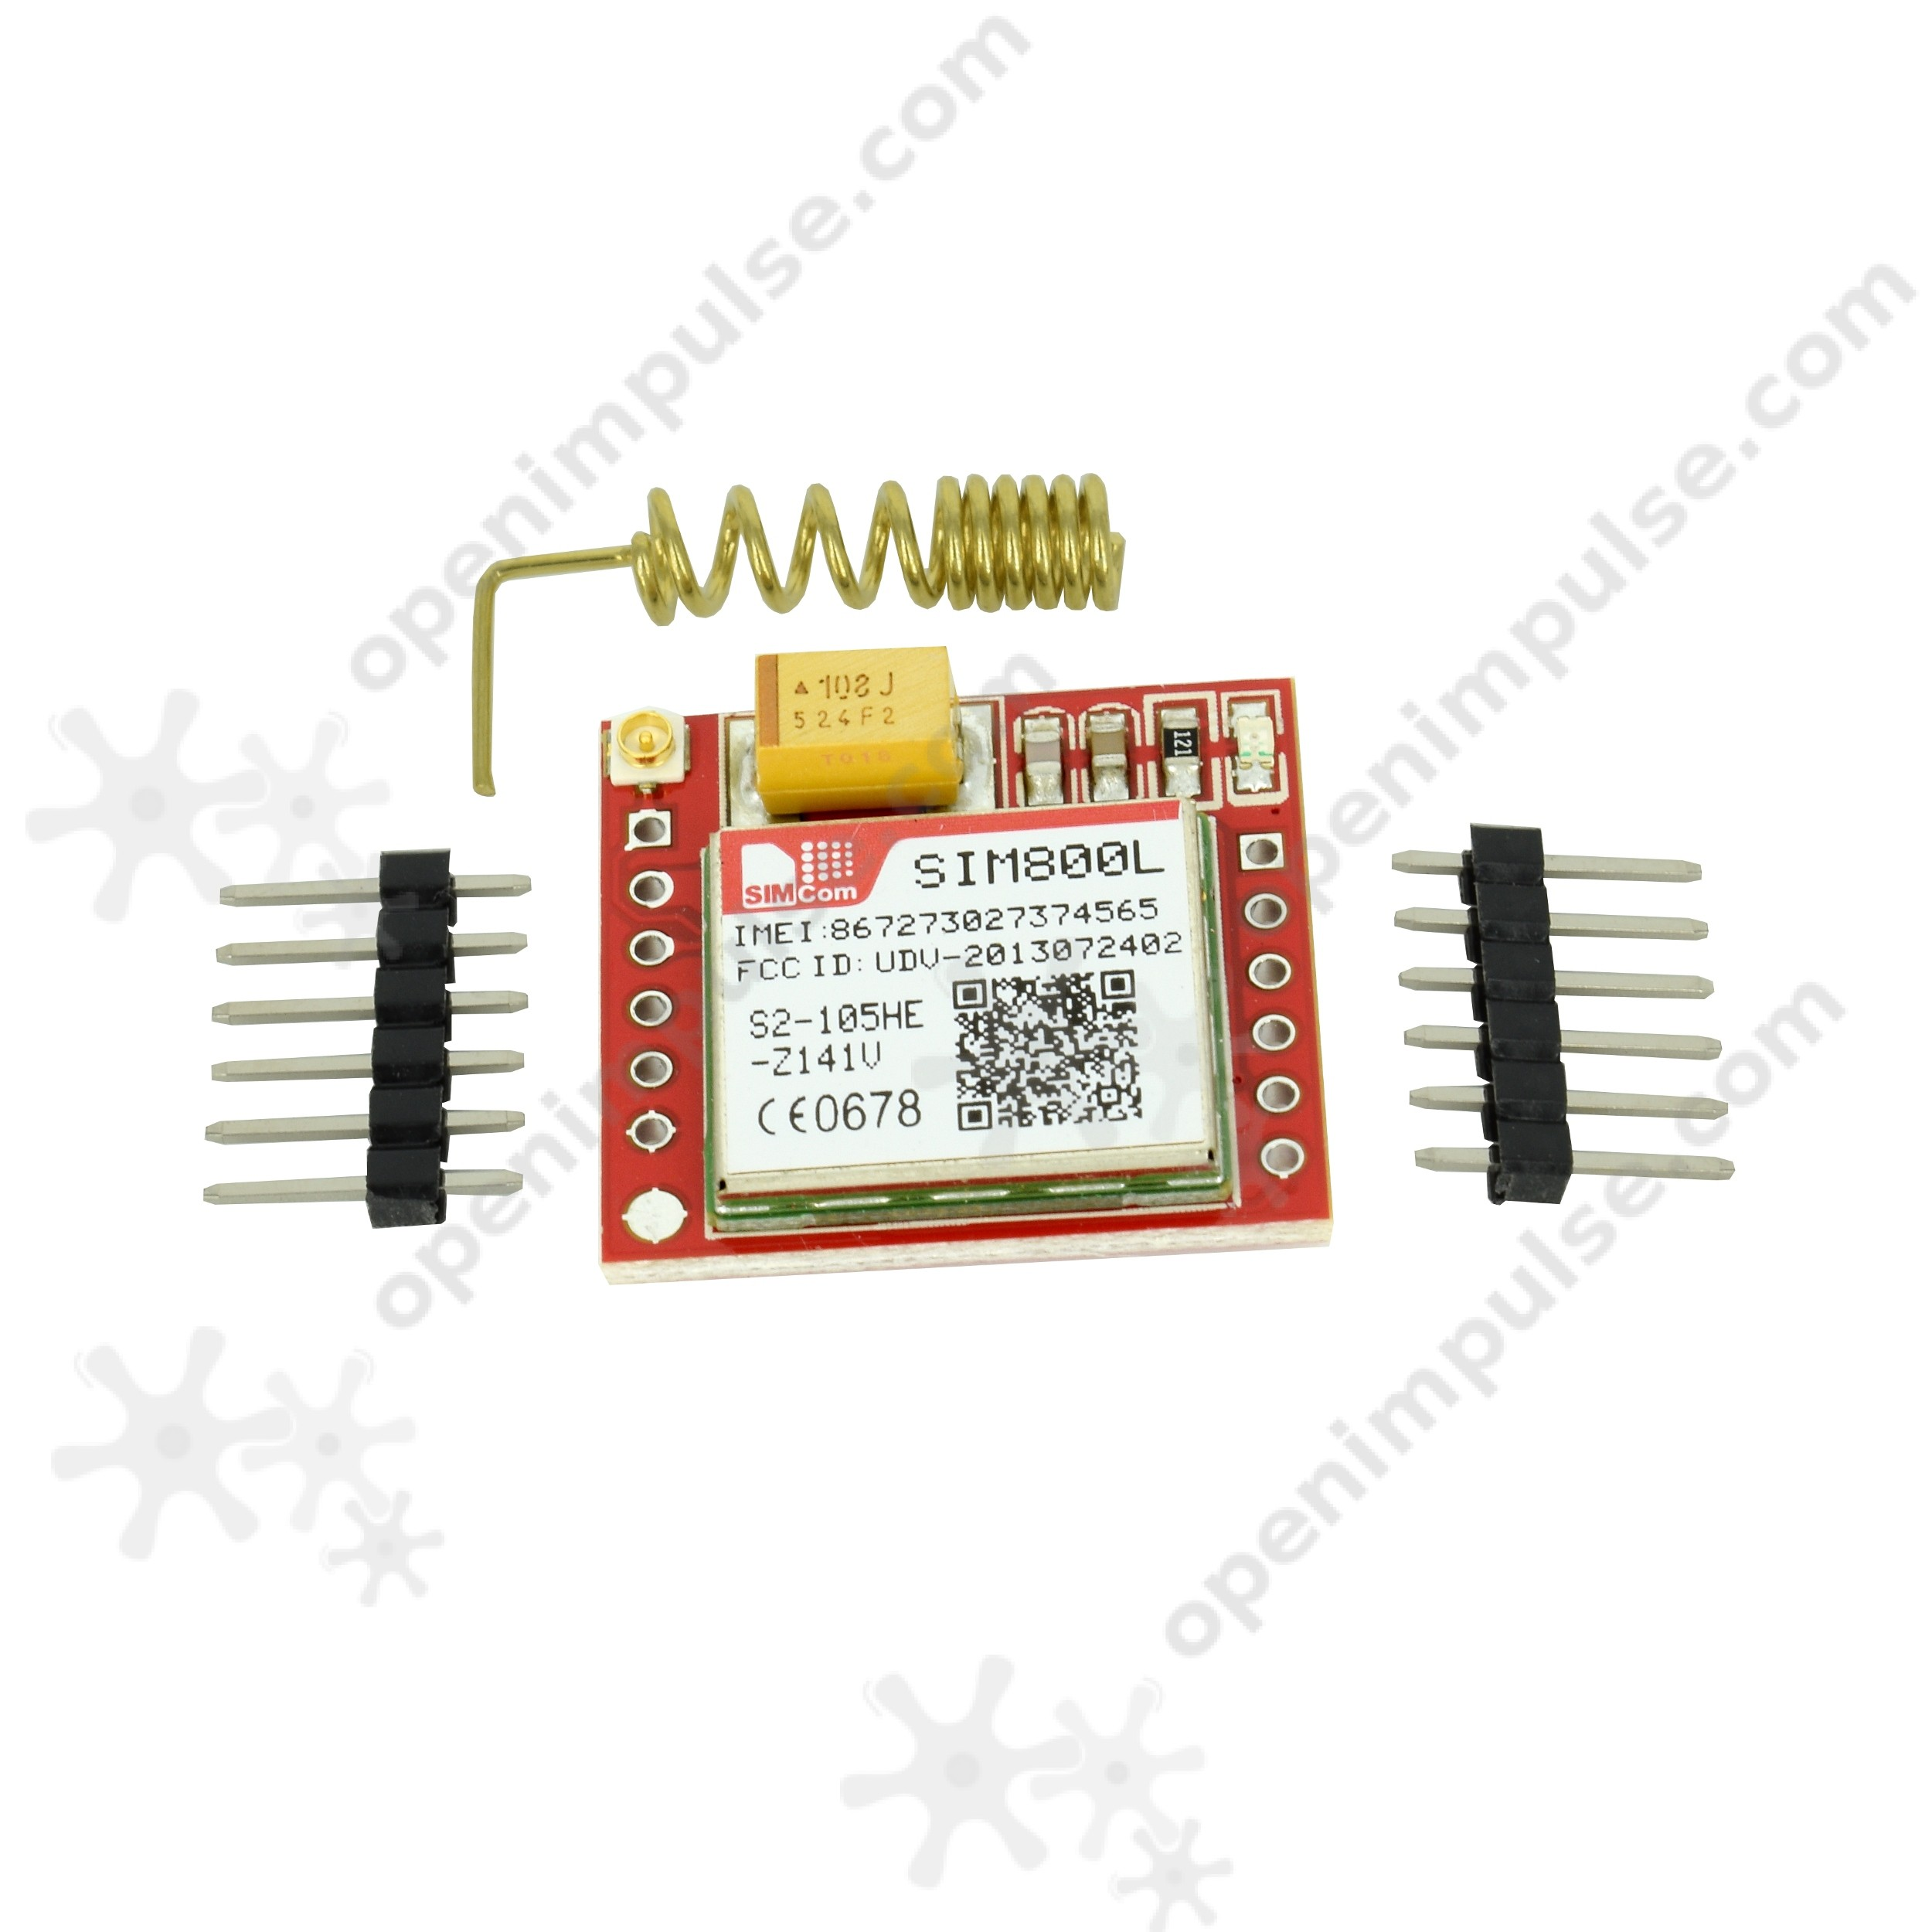 SIM800L GSM Module + PCB Antenna | Open ImpulseOpen Impulse